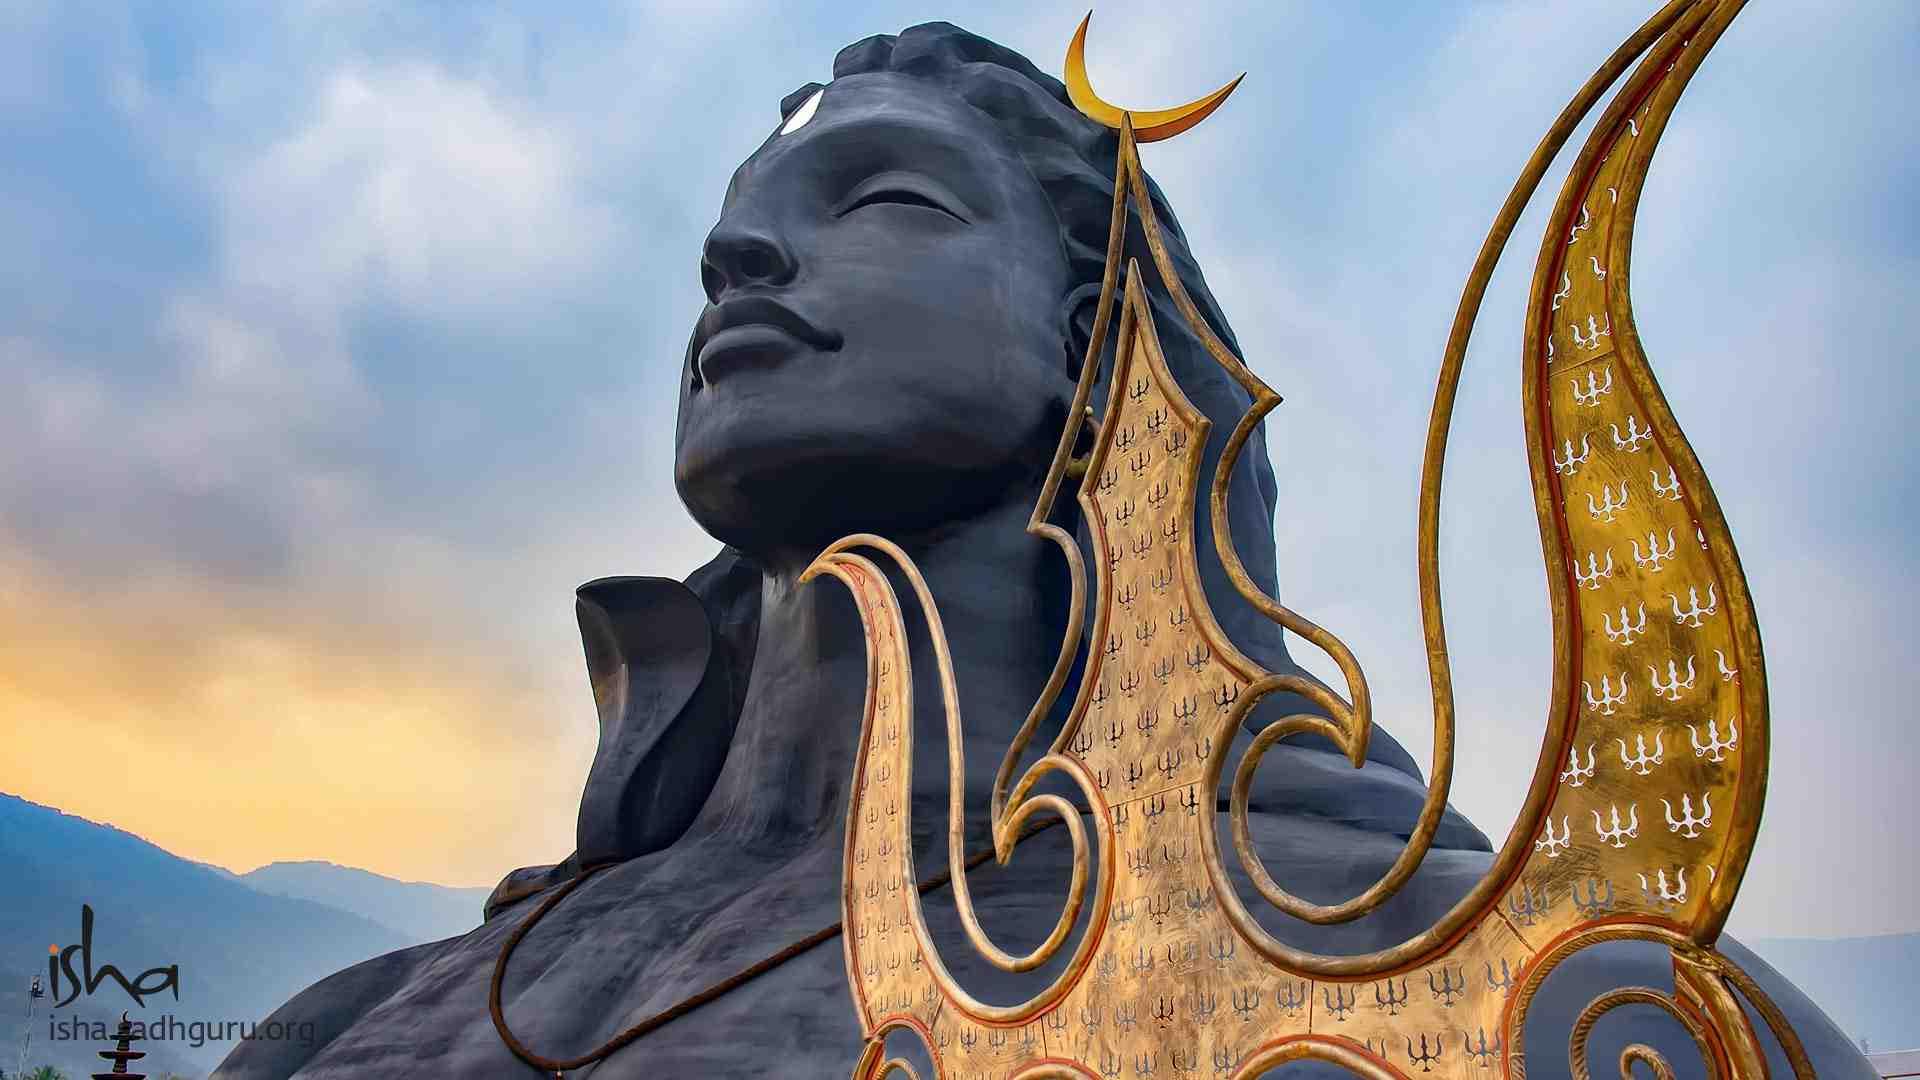 Shiva Wallpaper with his Trishul